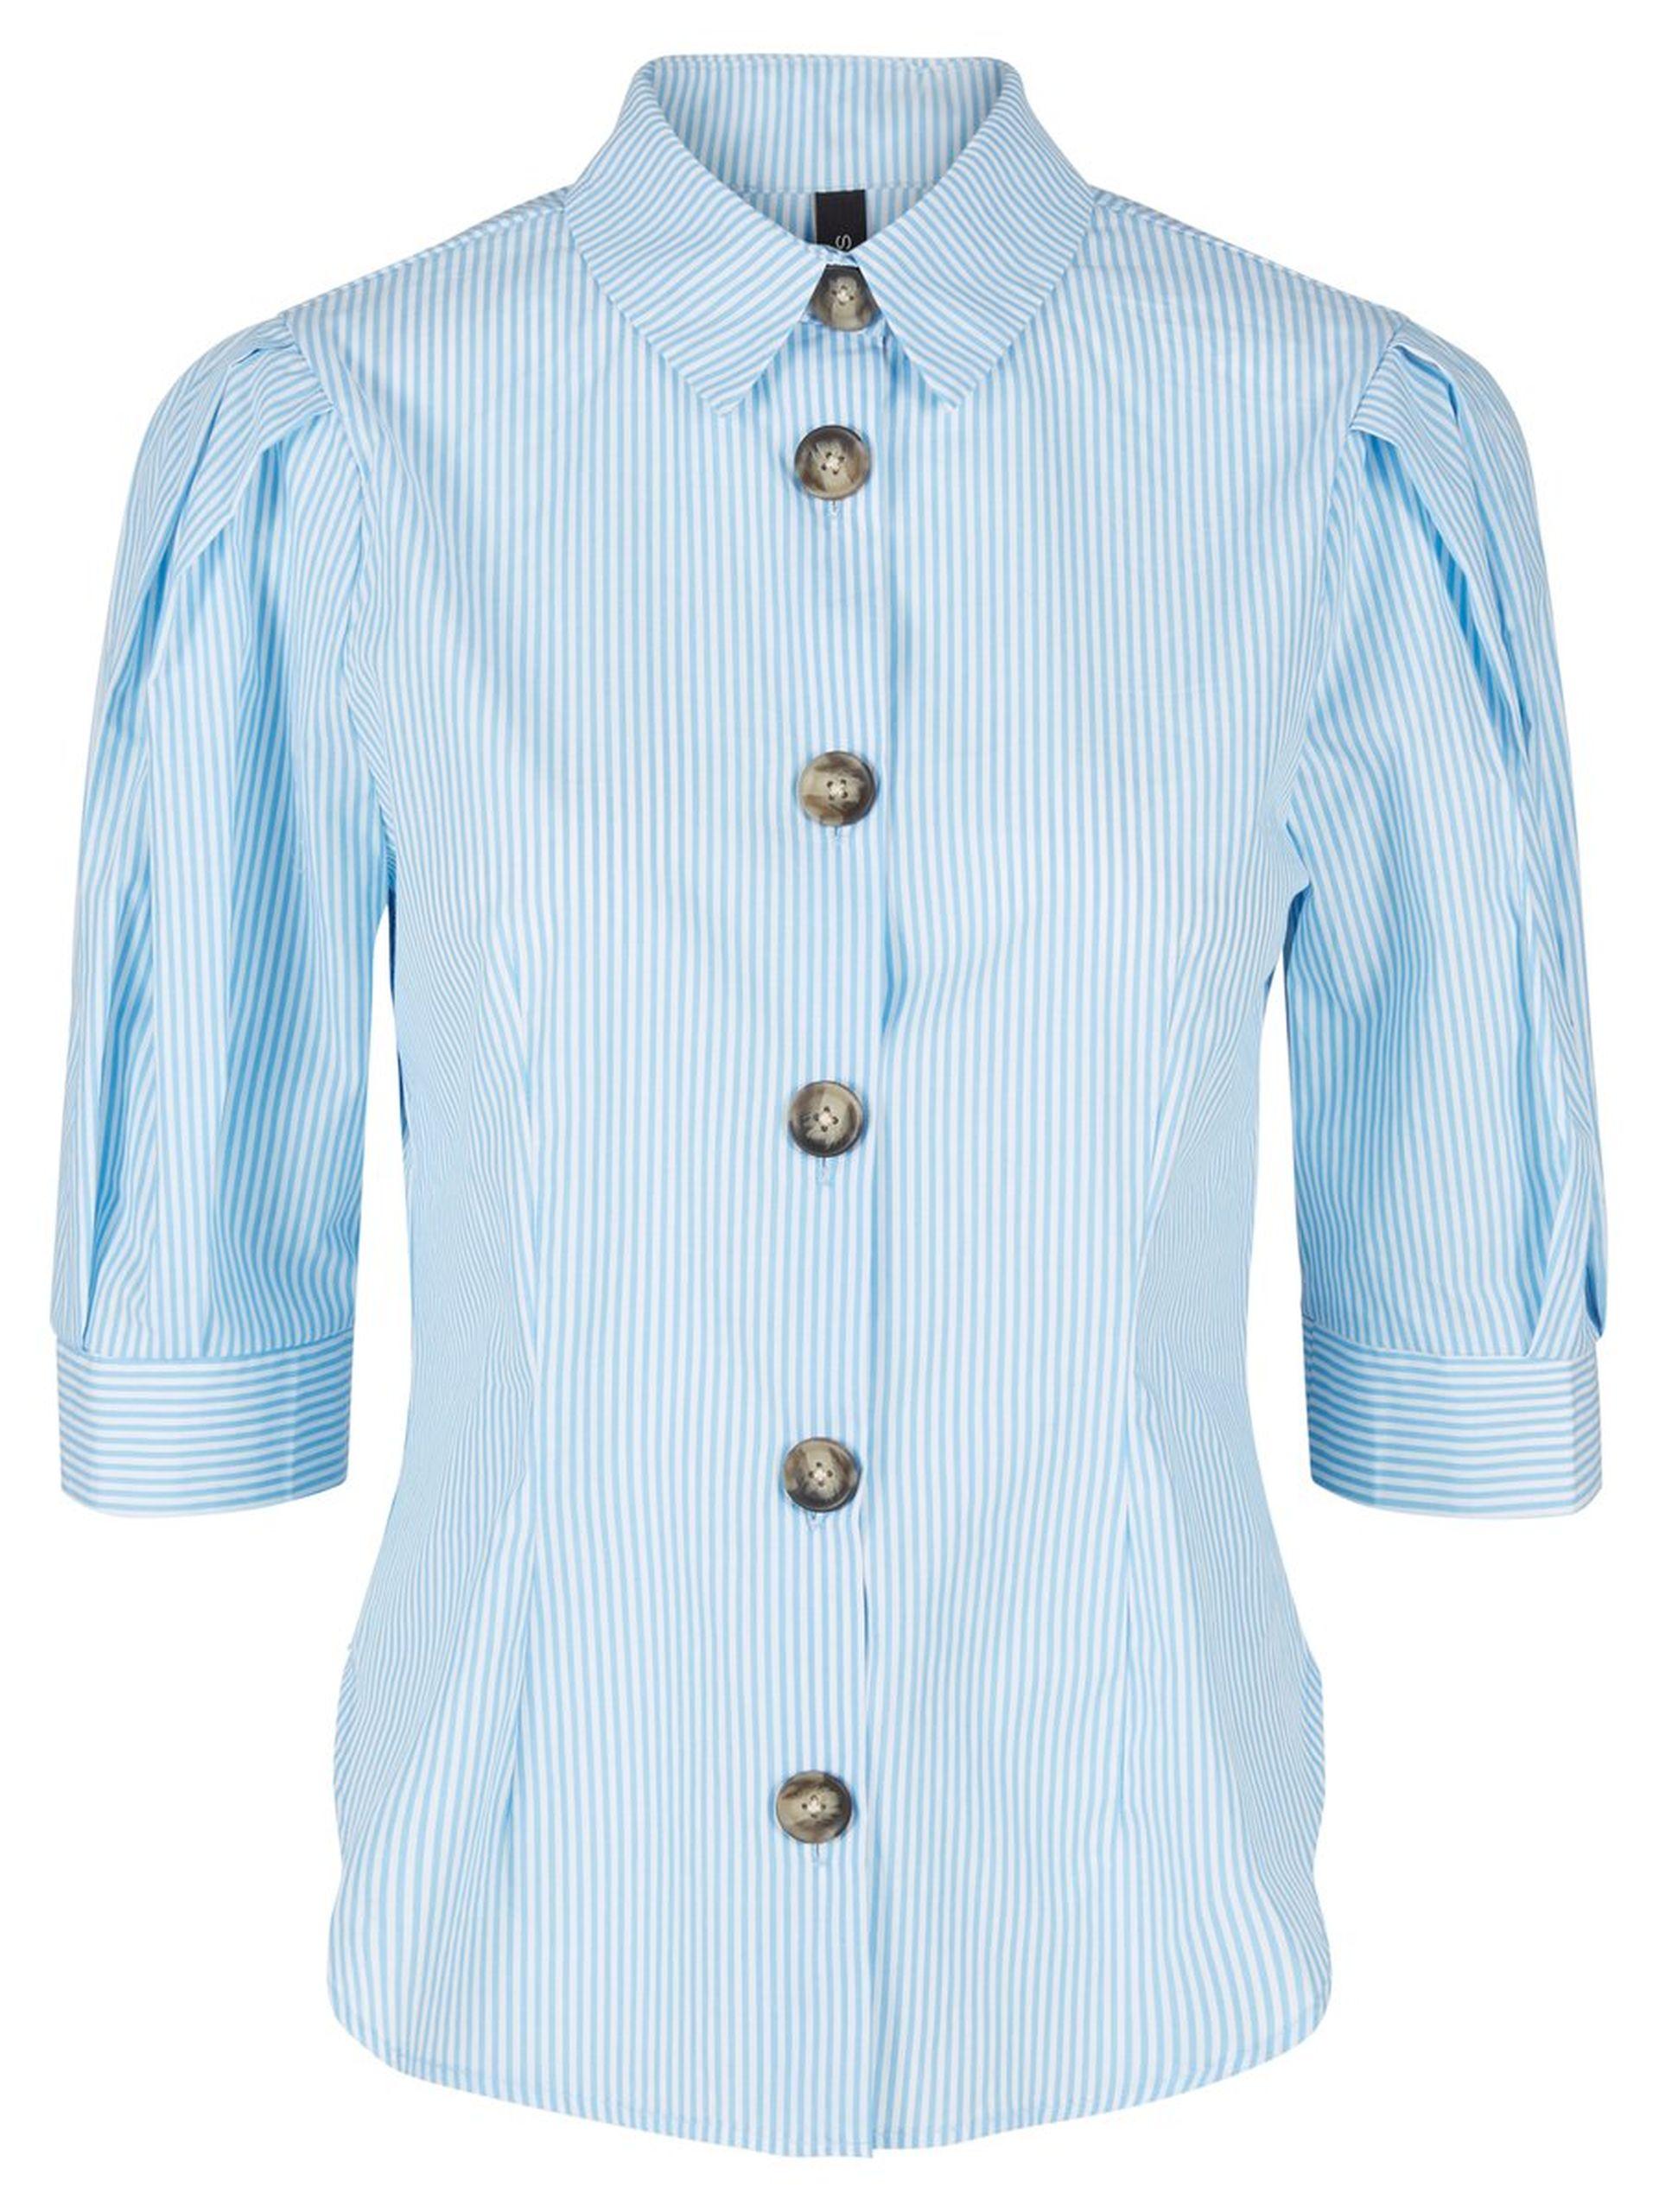 ee4d53f9 Bluse med puffarmer, bluse med hvite og blå striper, bluse med korte ...